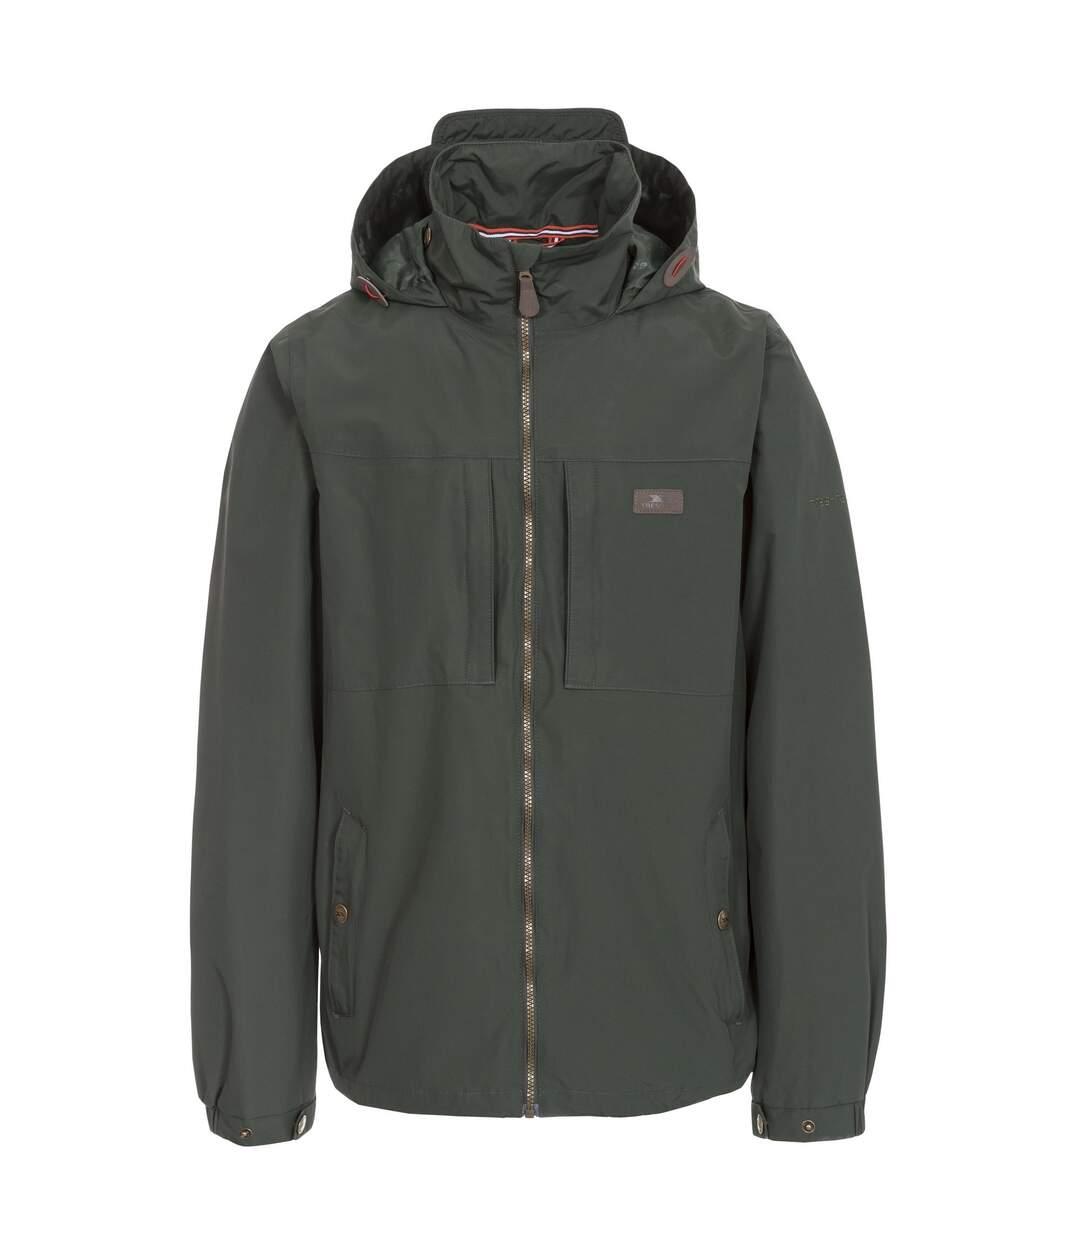 Trespass Mens Cartwright Waterproof Jacket (Olive) - UTTP4117